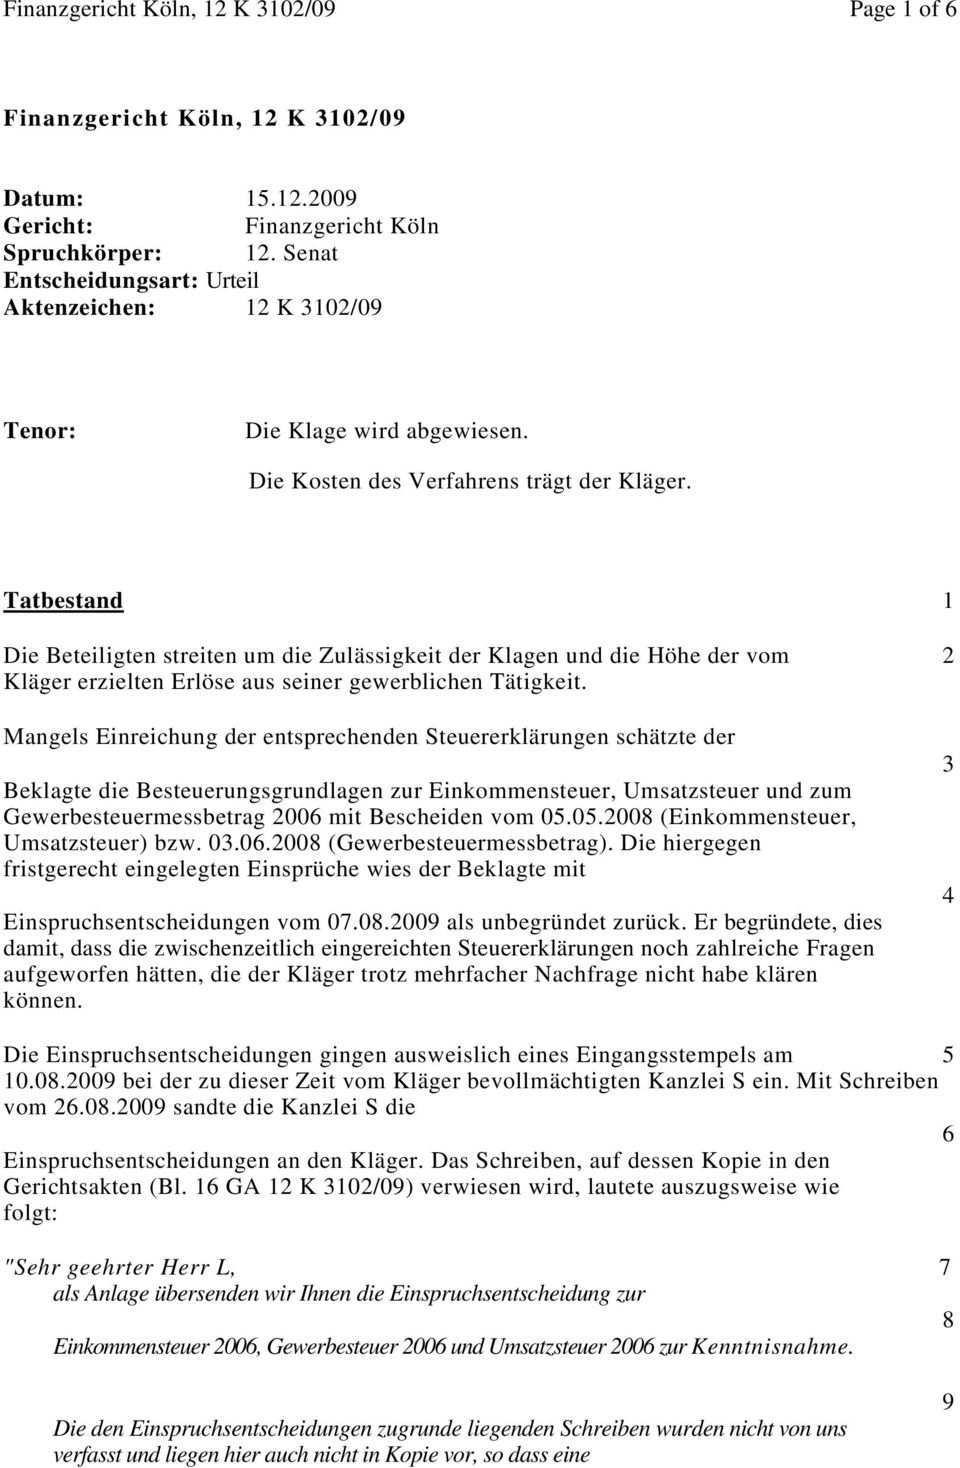 Finanzgericht Koln 12 K 3102 09 Page 1 Of 6 Pdf Free Download